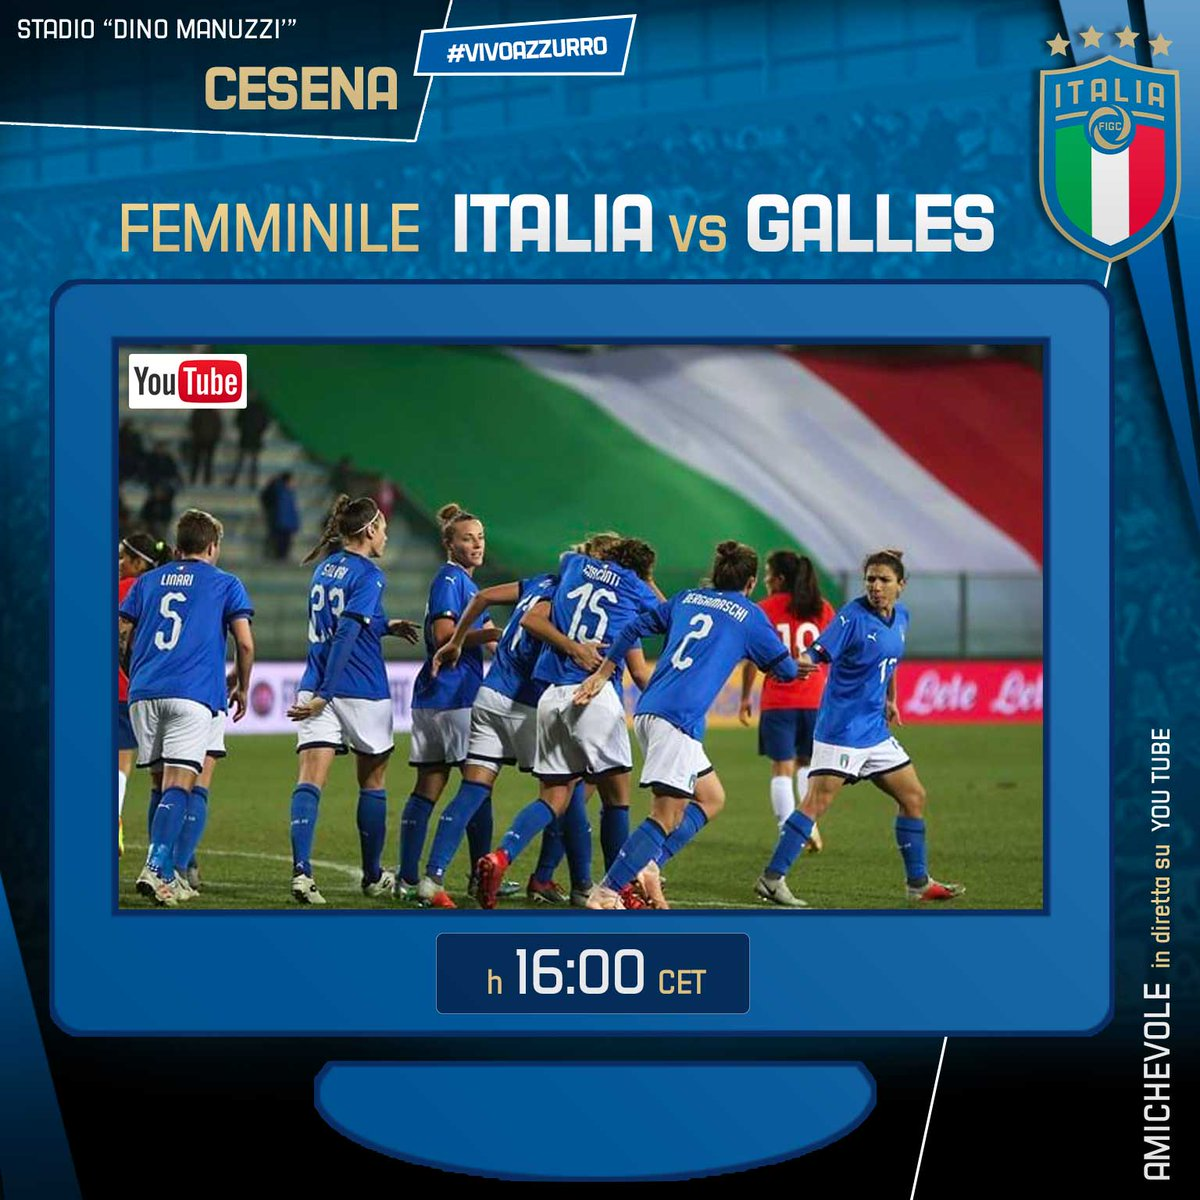 #Azzurre 💙 🇮🇹 #ItaliaGalles🏴 - Amichevole 🏟 Stadio #DinoManuzzi - #Cesena 🗓 Oggi ⏰ h 16.00 💻 Diretta streaming #YouTube ℹ️ Info: https://bit.ly/2sEnBel  #VivoAzzurro #Nazionale #ForzaAzzurre @FIGCfemminile